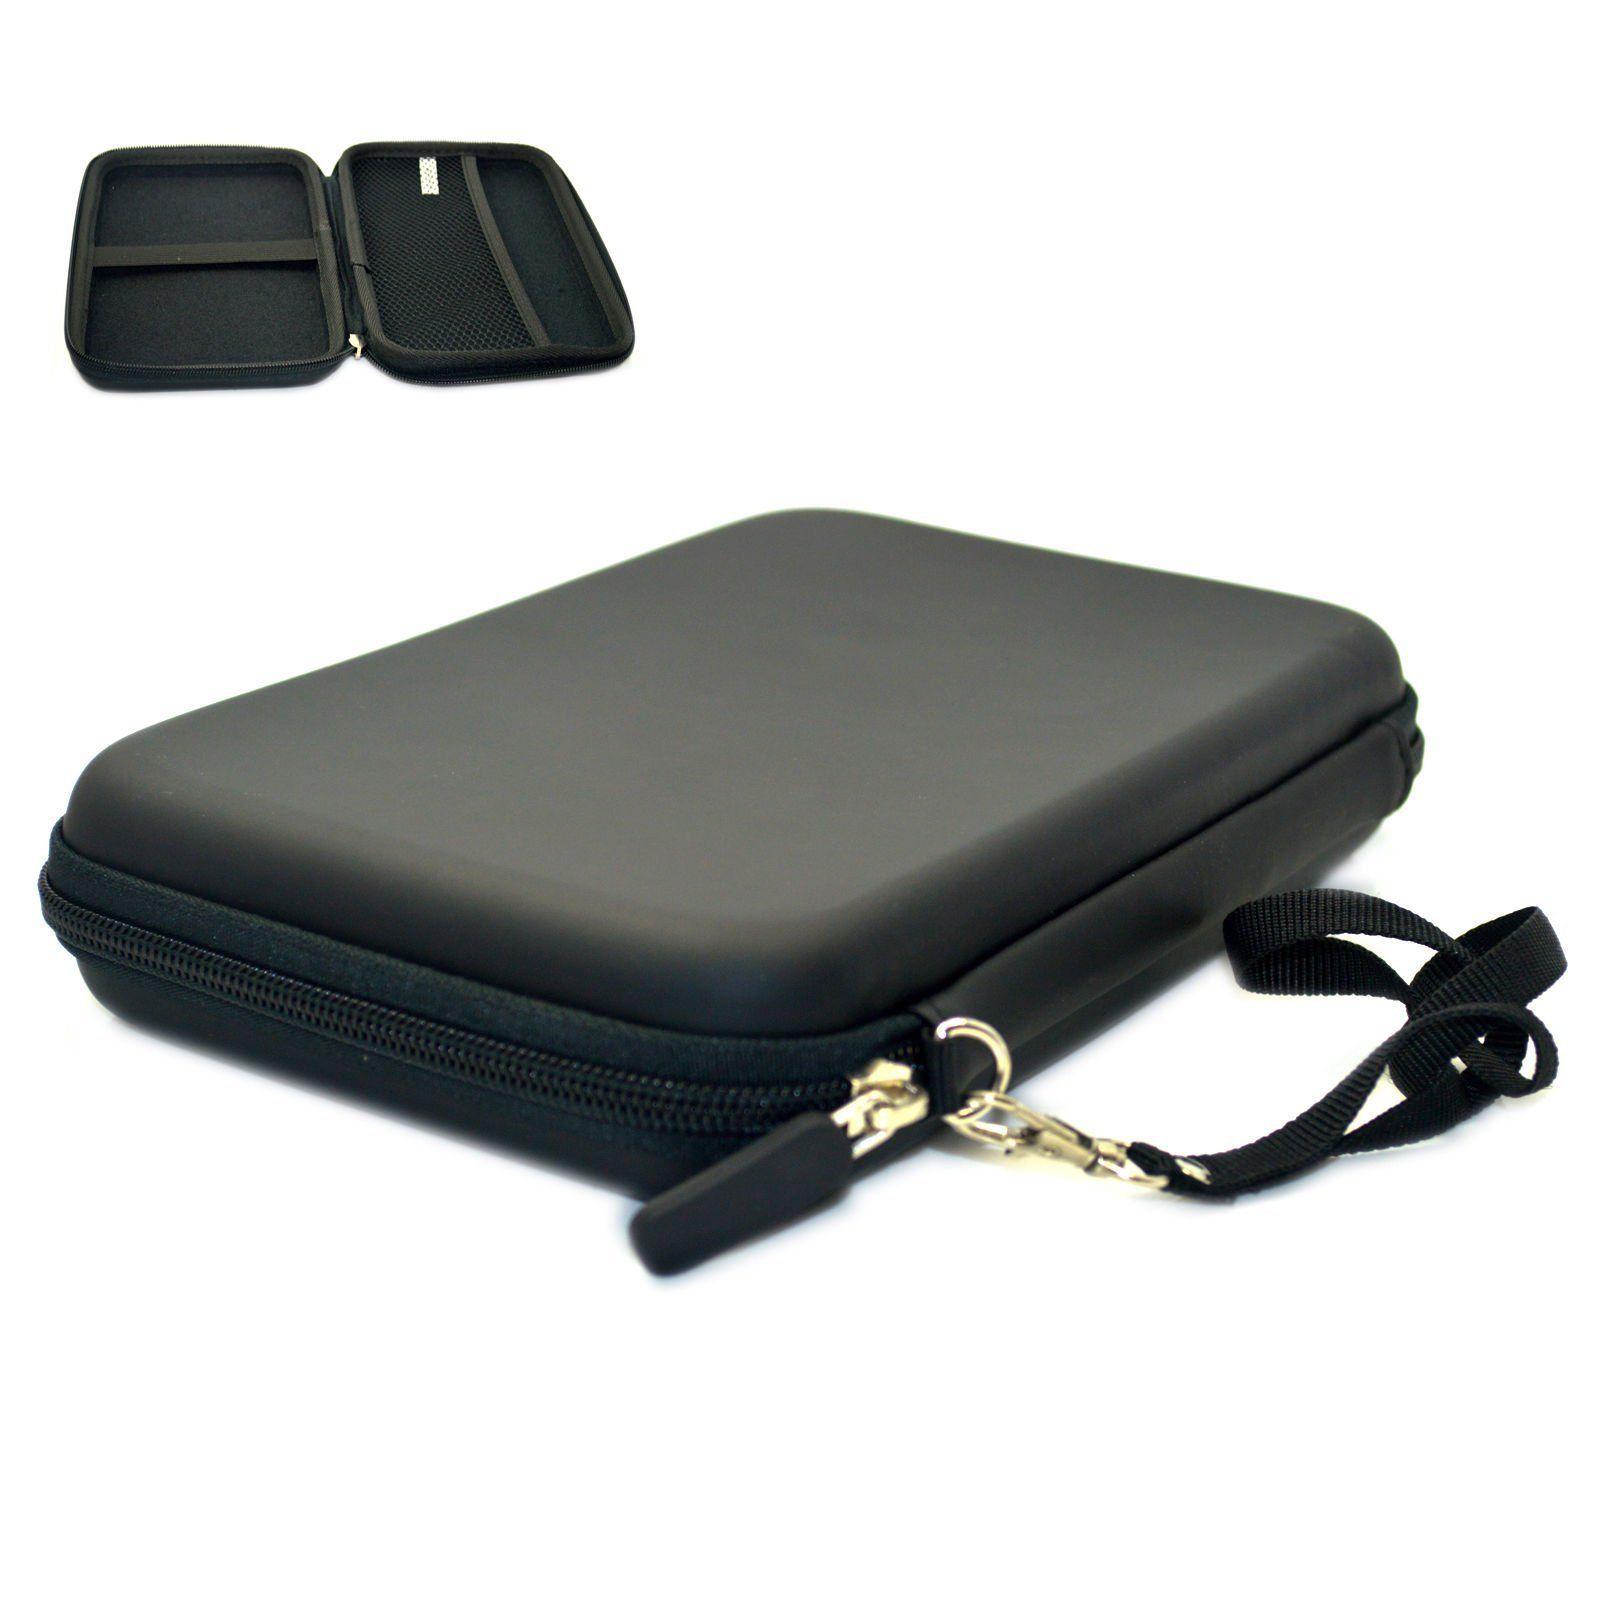 Black 7 GPS Carrying Case Hard Shell Travel EVA Bag Zipper Cover Pouch for 6 7 Garmin Navigation Nuvi Tomtom Magellan Mio